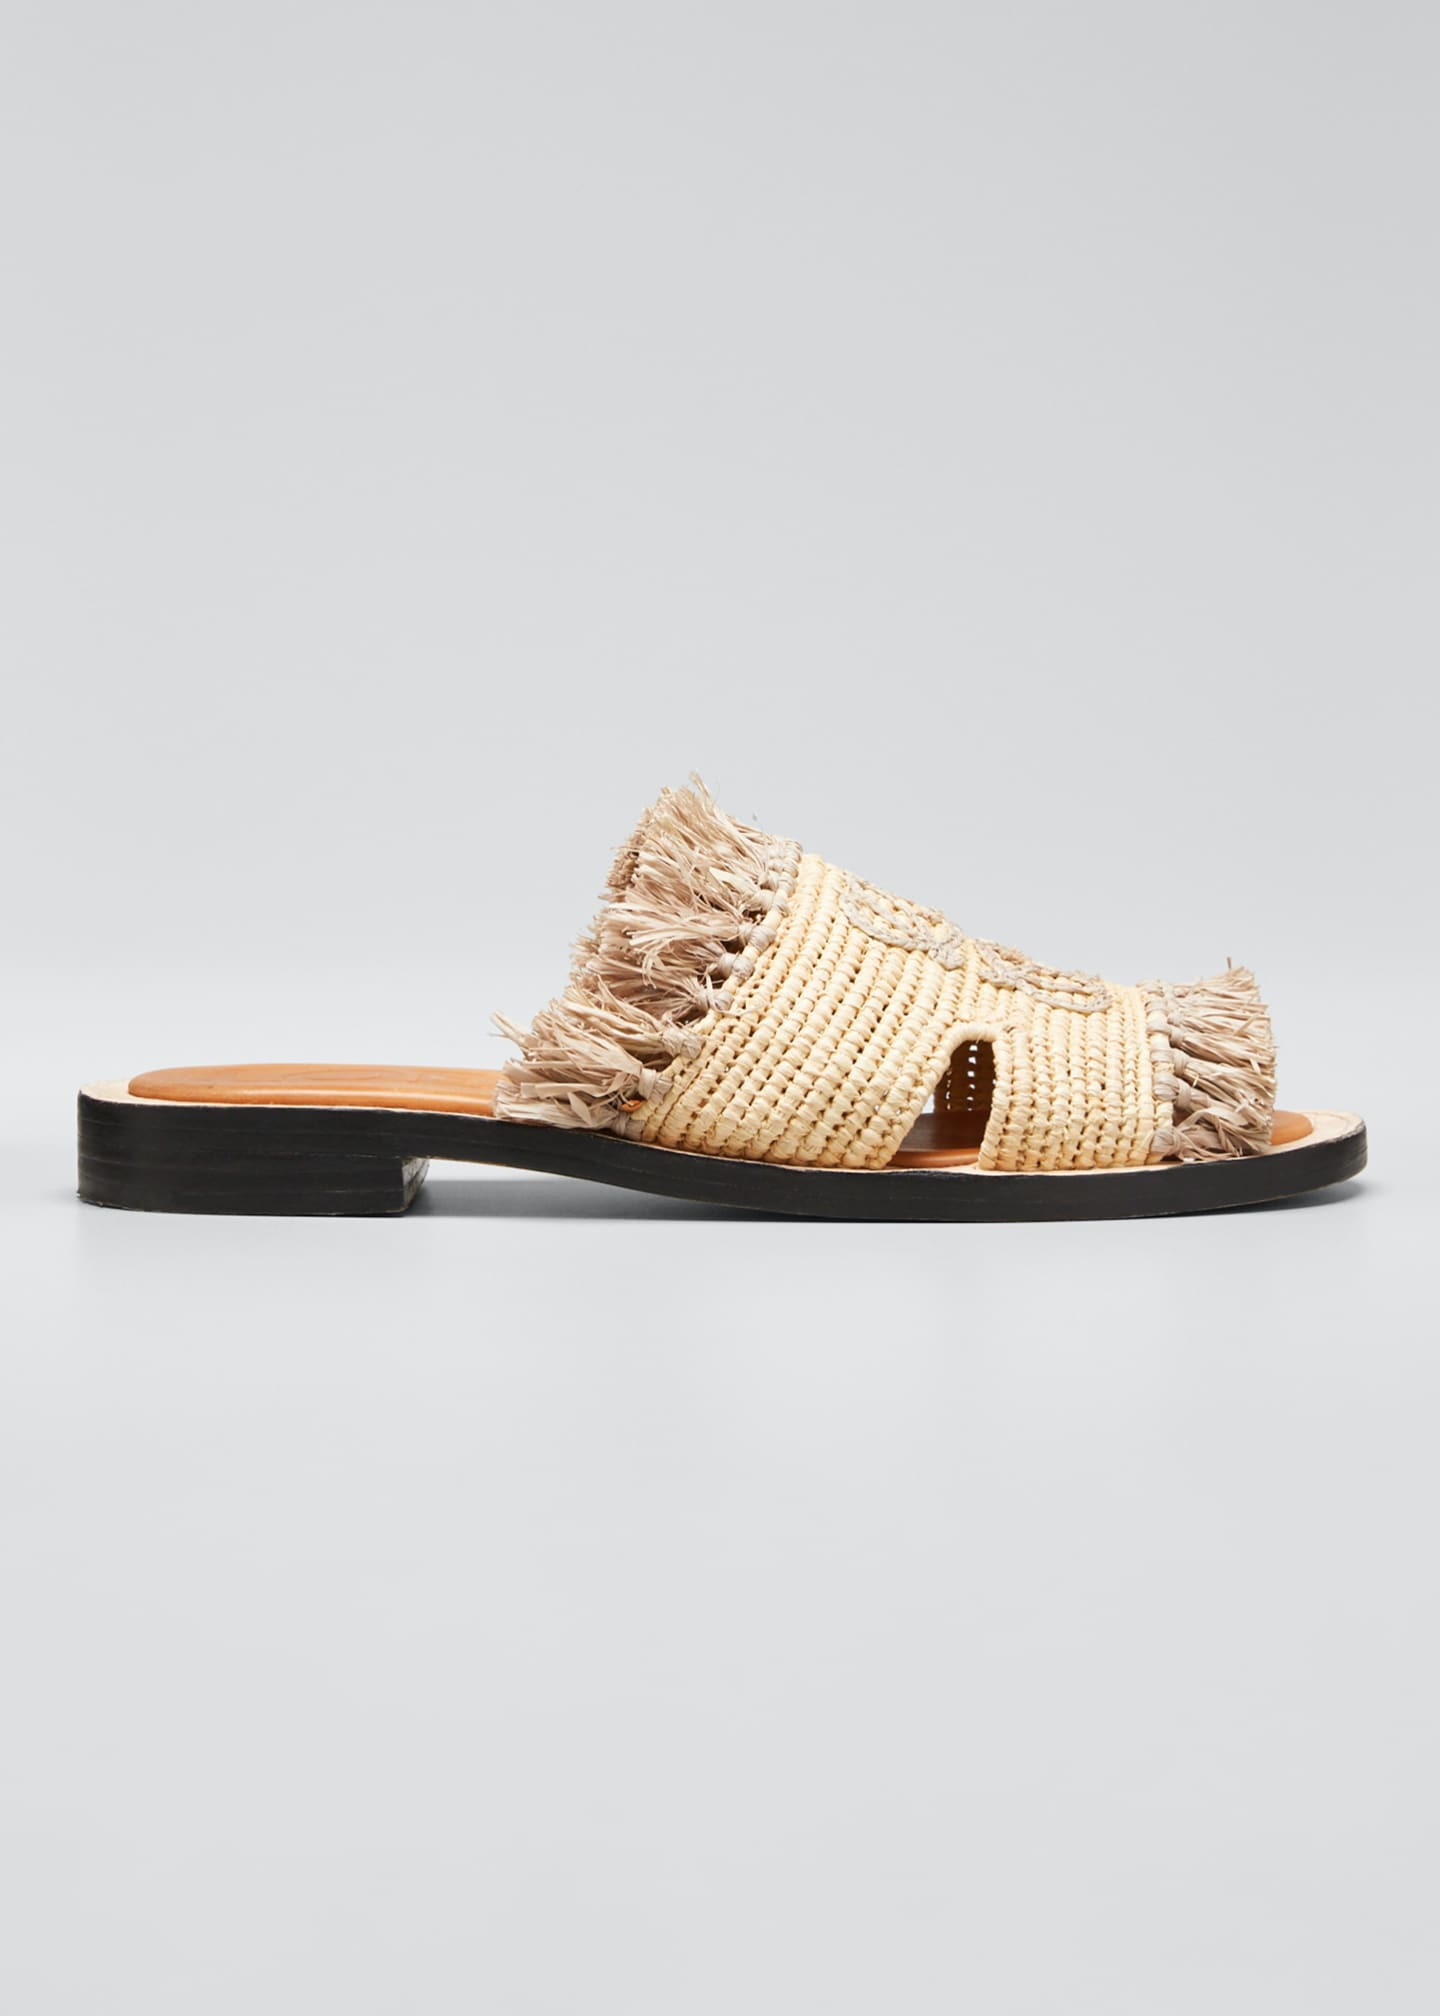 Loewe Woven Raffia Fringe Sandals